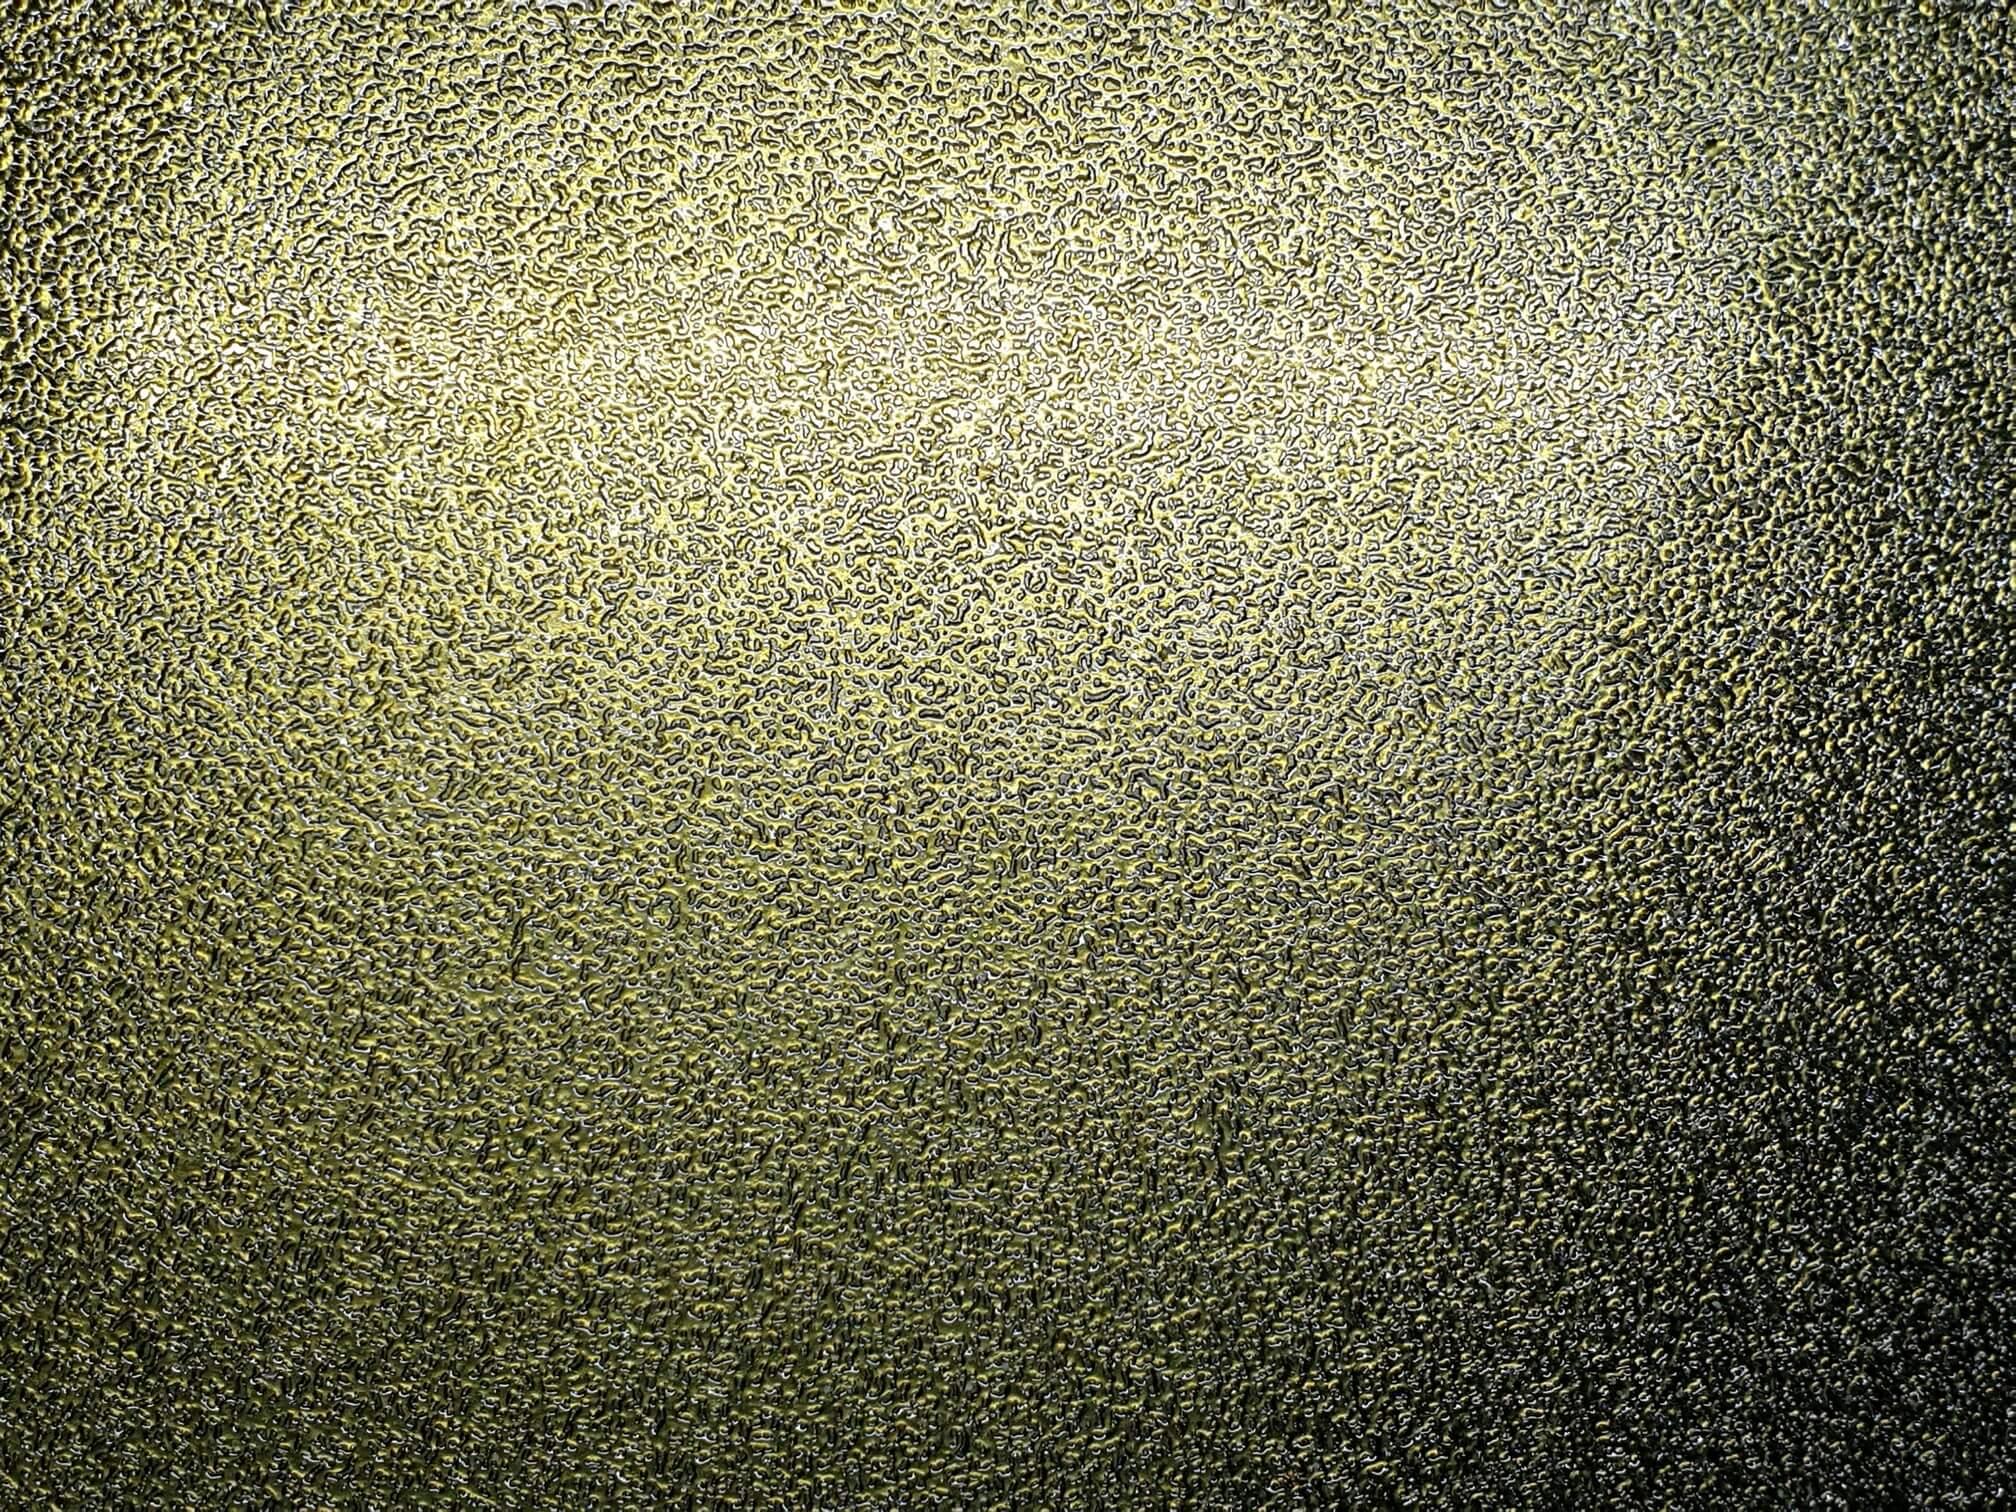 Textured PEI Powder Steel Plate from Banggood 4 | Textured PEI Powder Steel Plate from Banggood